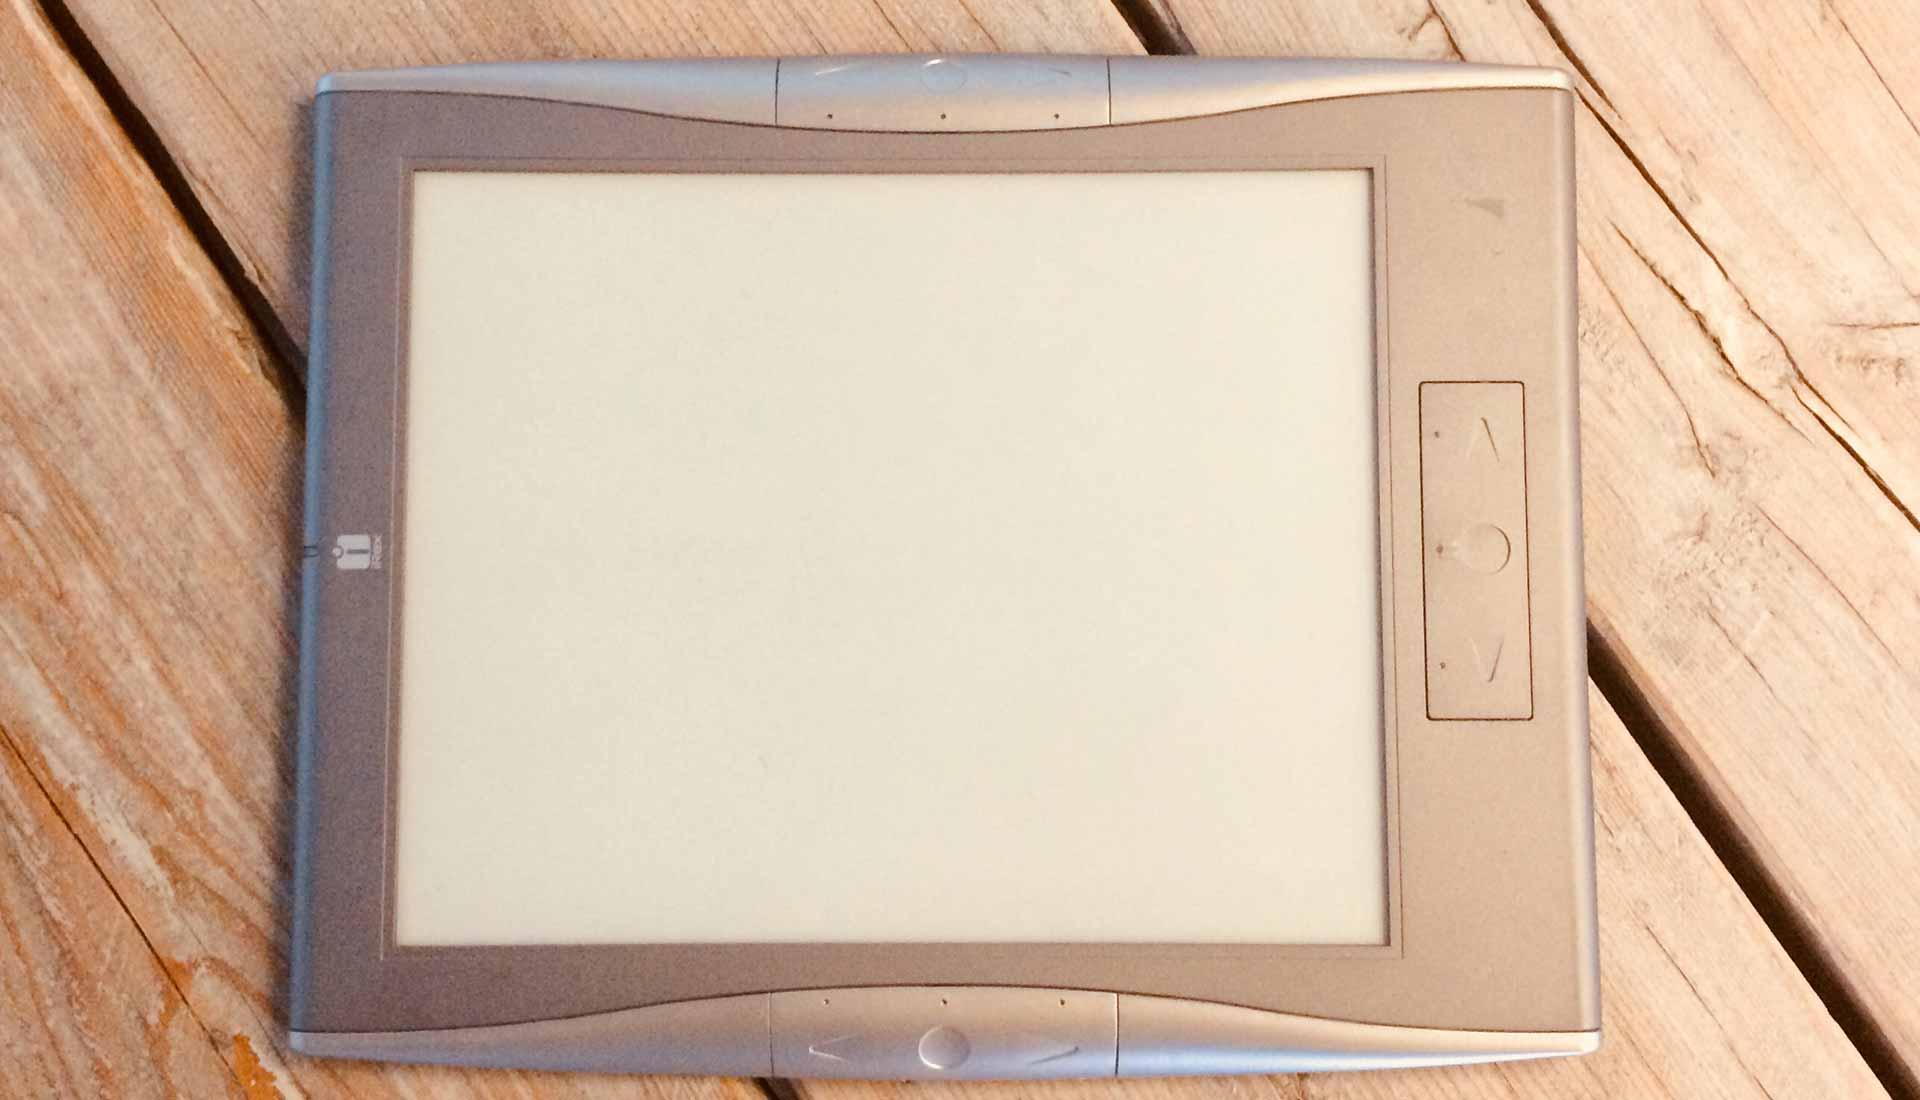 Ereader met e-Ink technologie - Lekker online lezen - OurMeeting